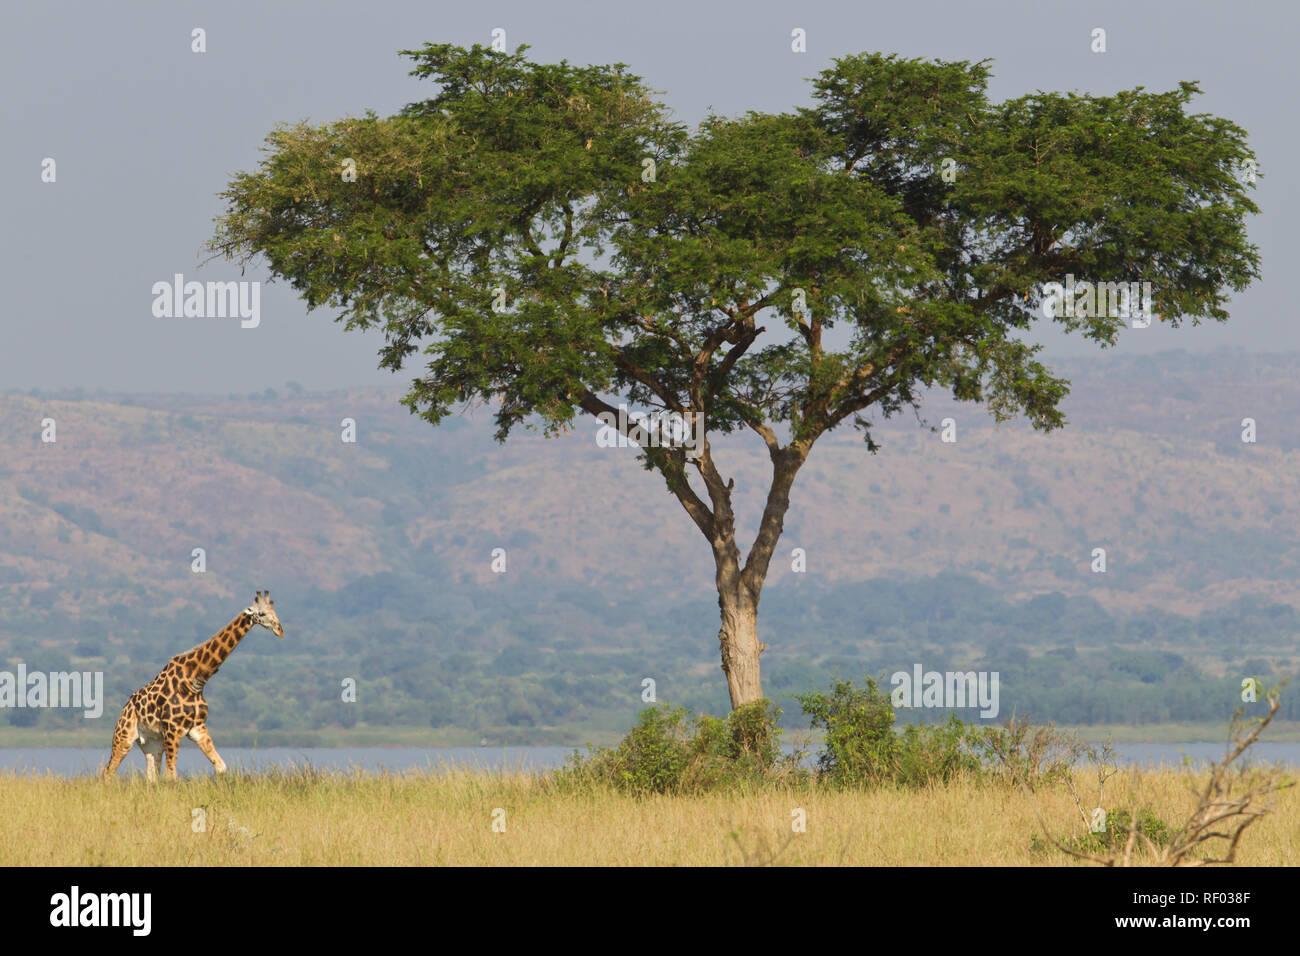 Murchison Falls National Park, Uganda, protects an important population of the endangered Rothschild's giraffe, Giraffa camelopardalis rothschildi - Stock Image